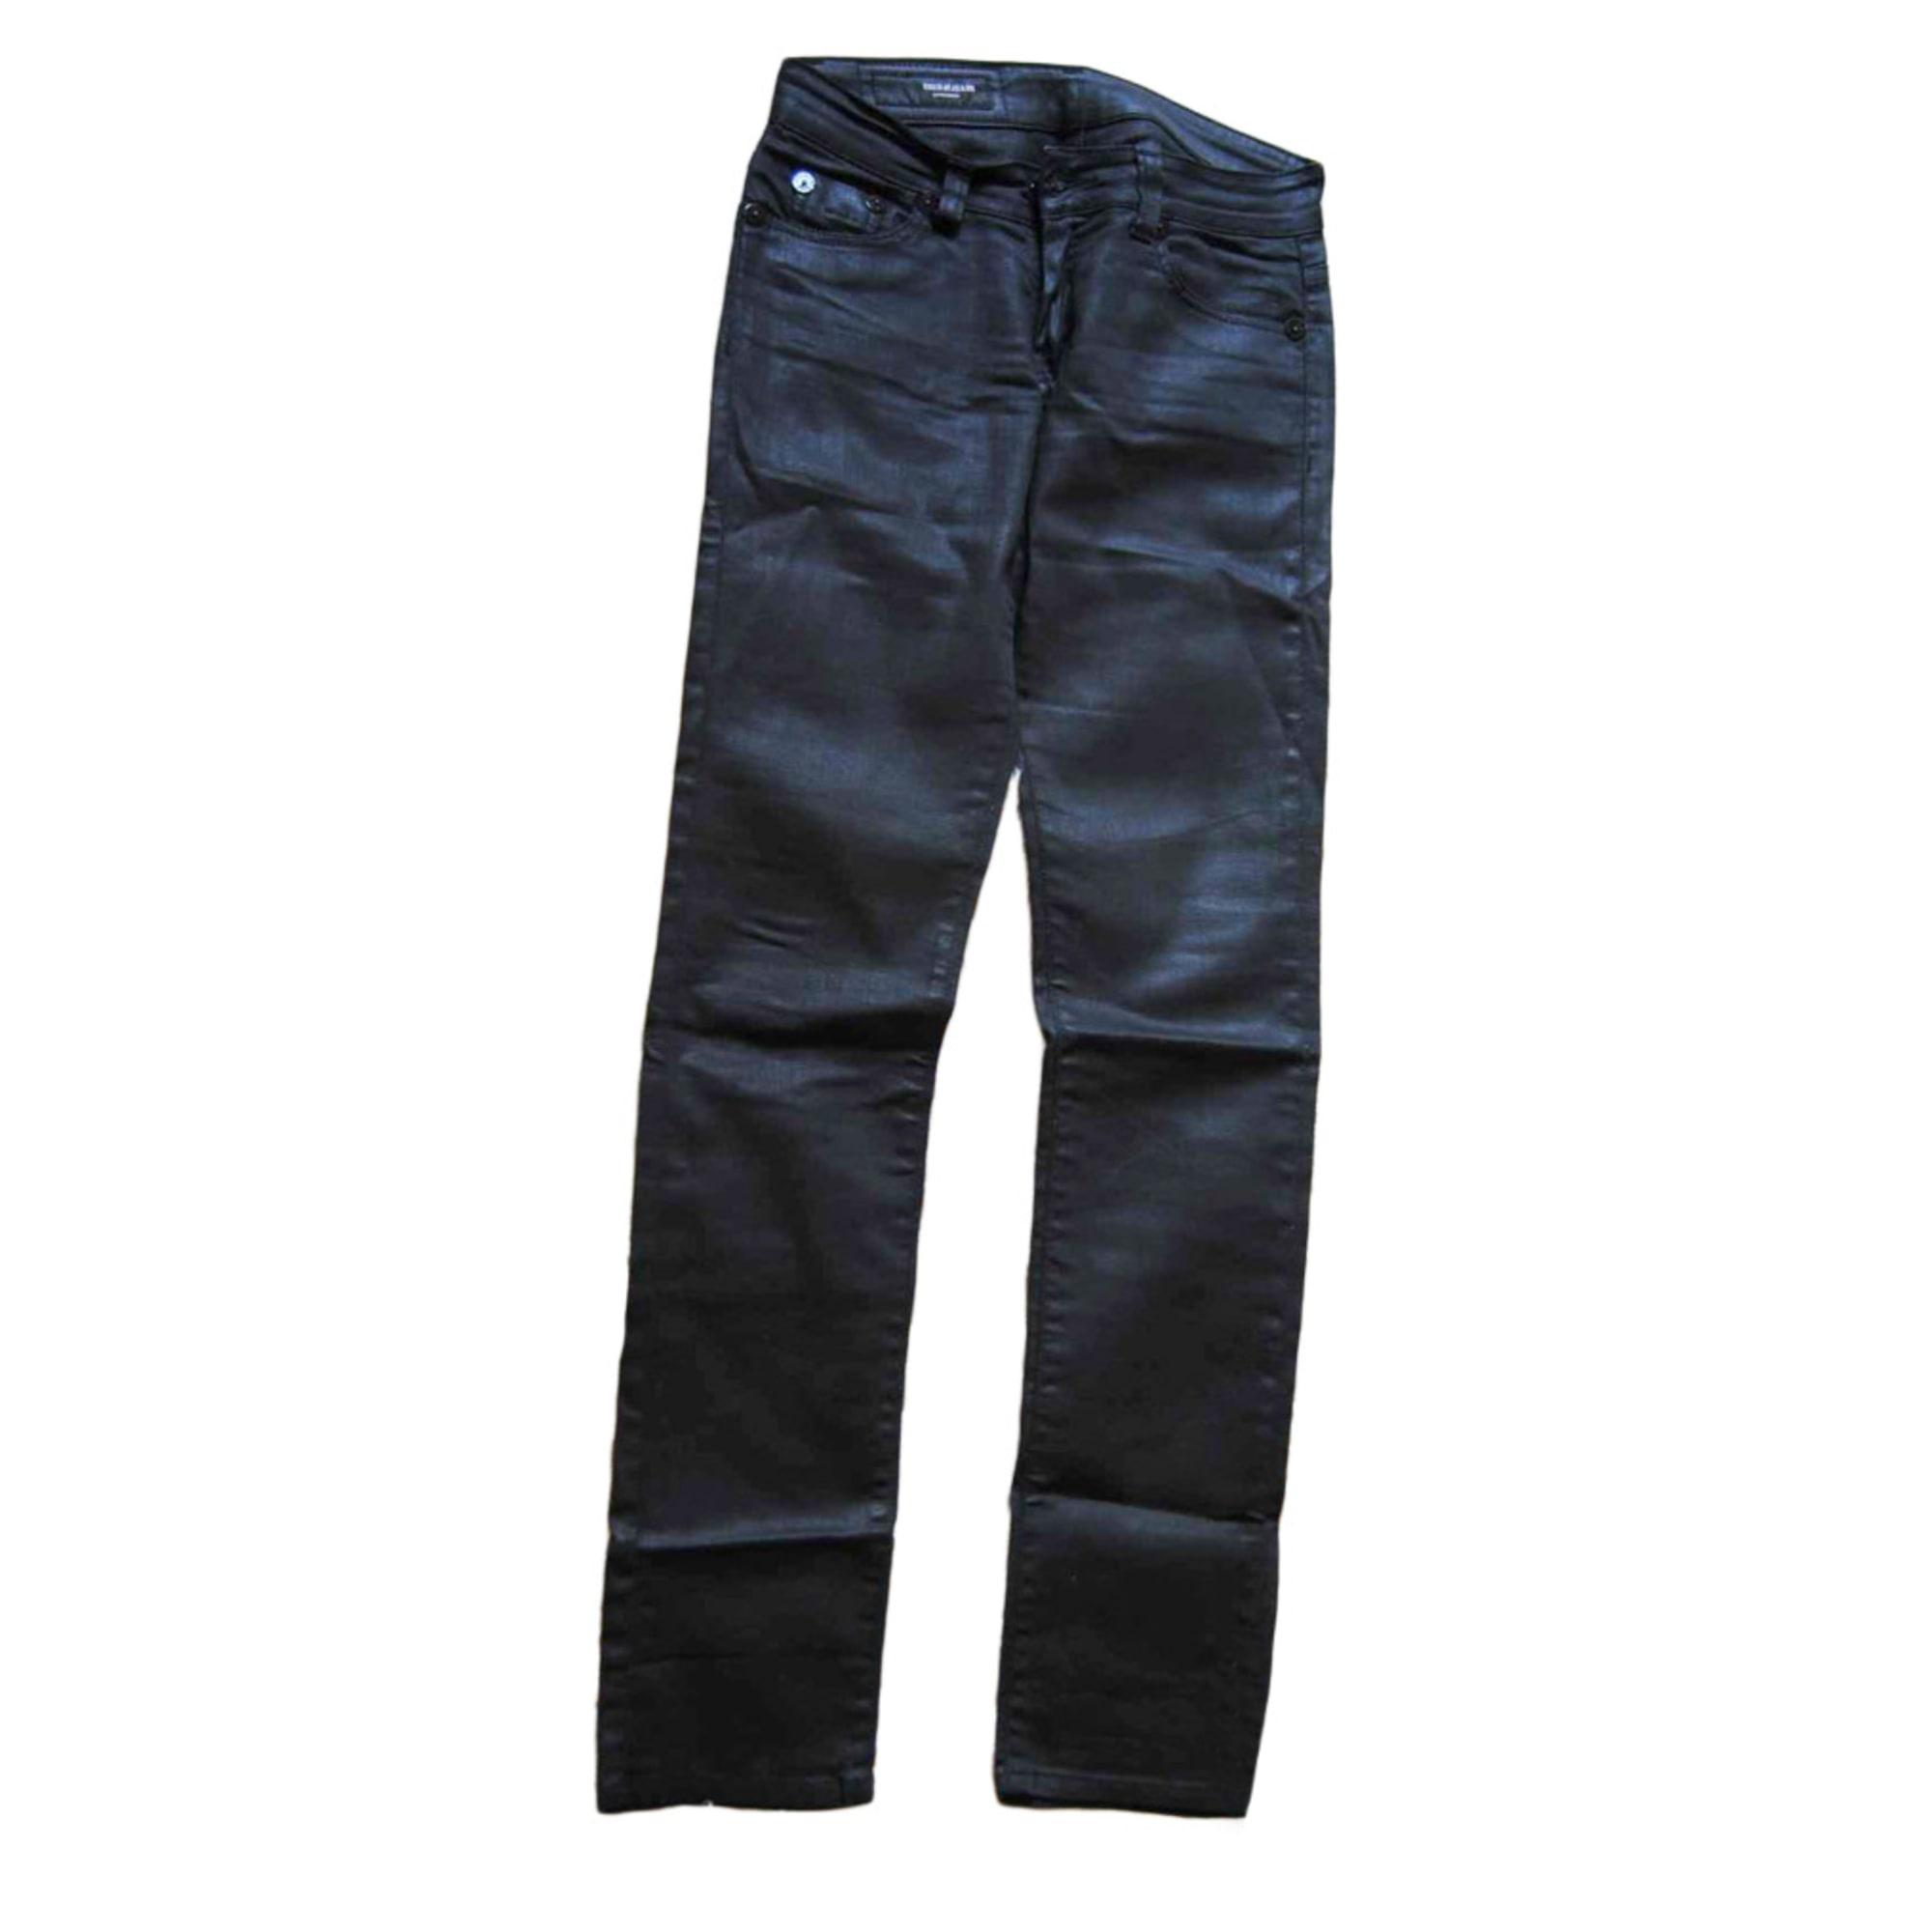 Pantalon slim, cigarette USED Noir